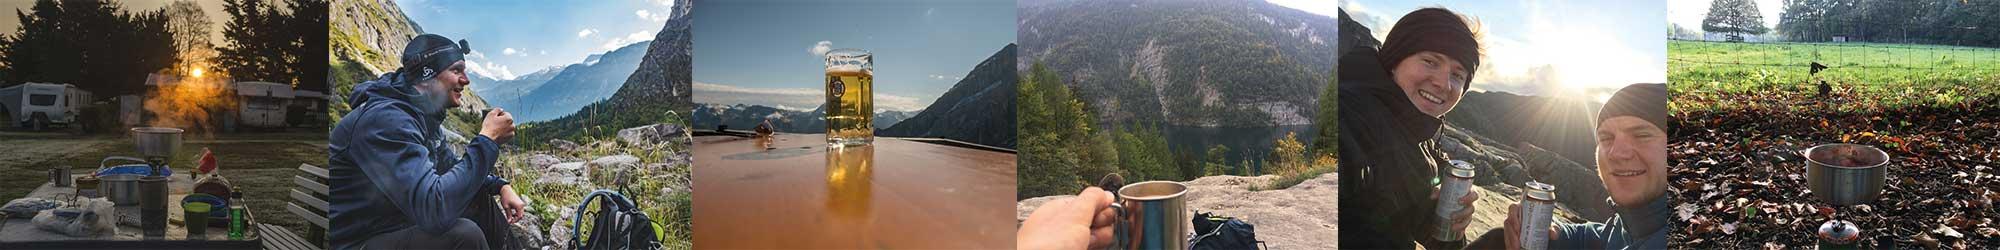 Wandern-Anfaenger-Tipps-Verpflegung